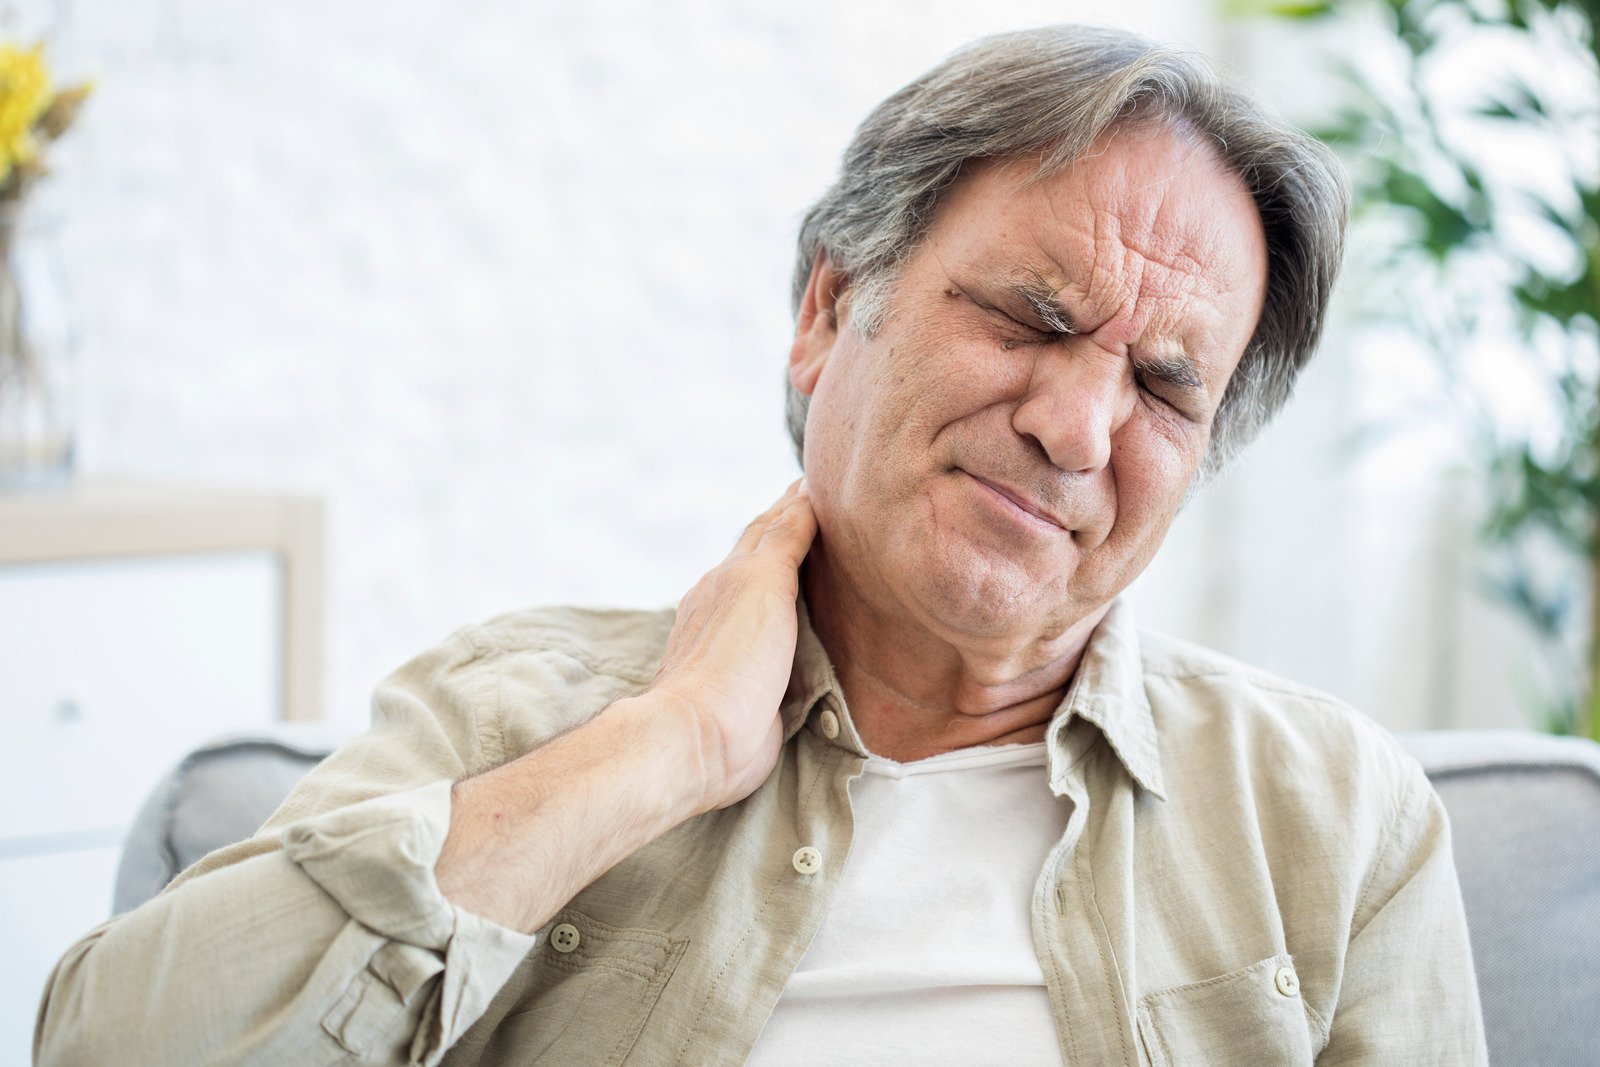 acupuncture forneck pain